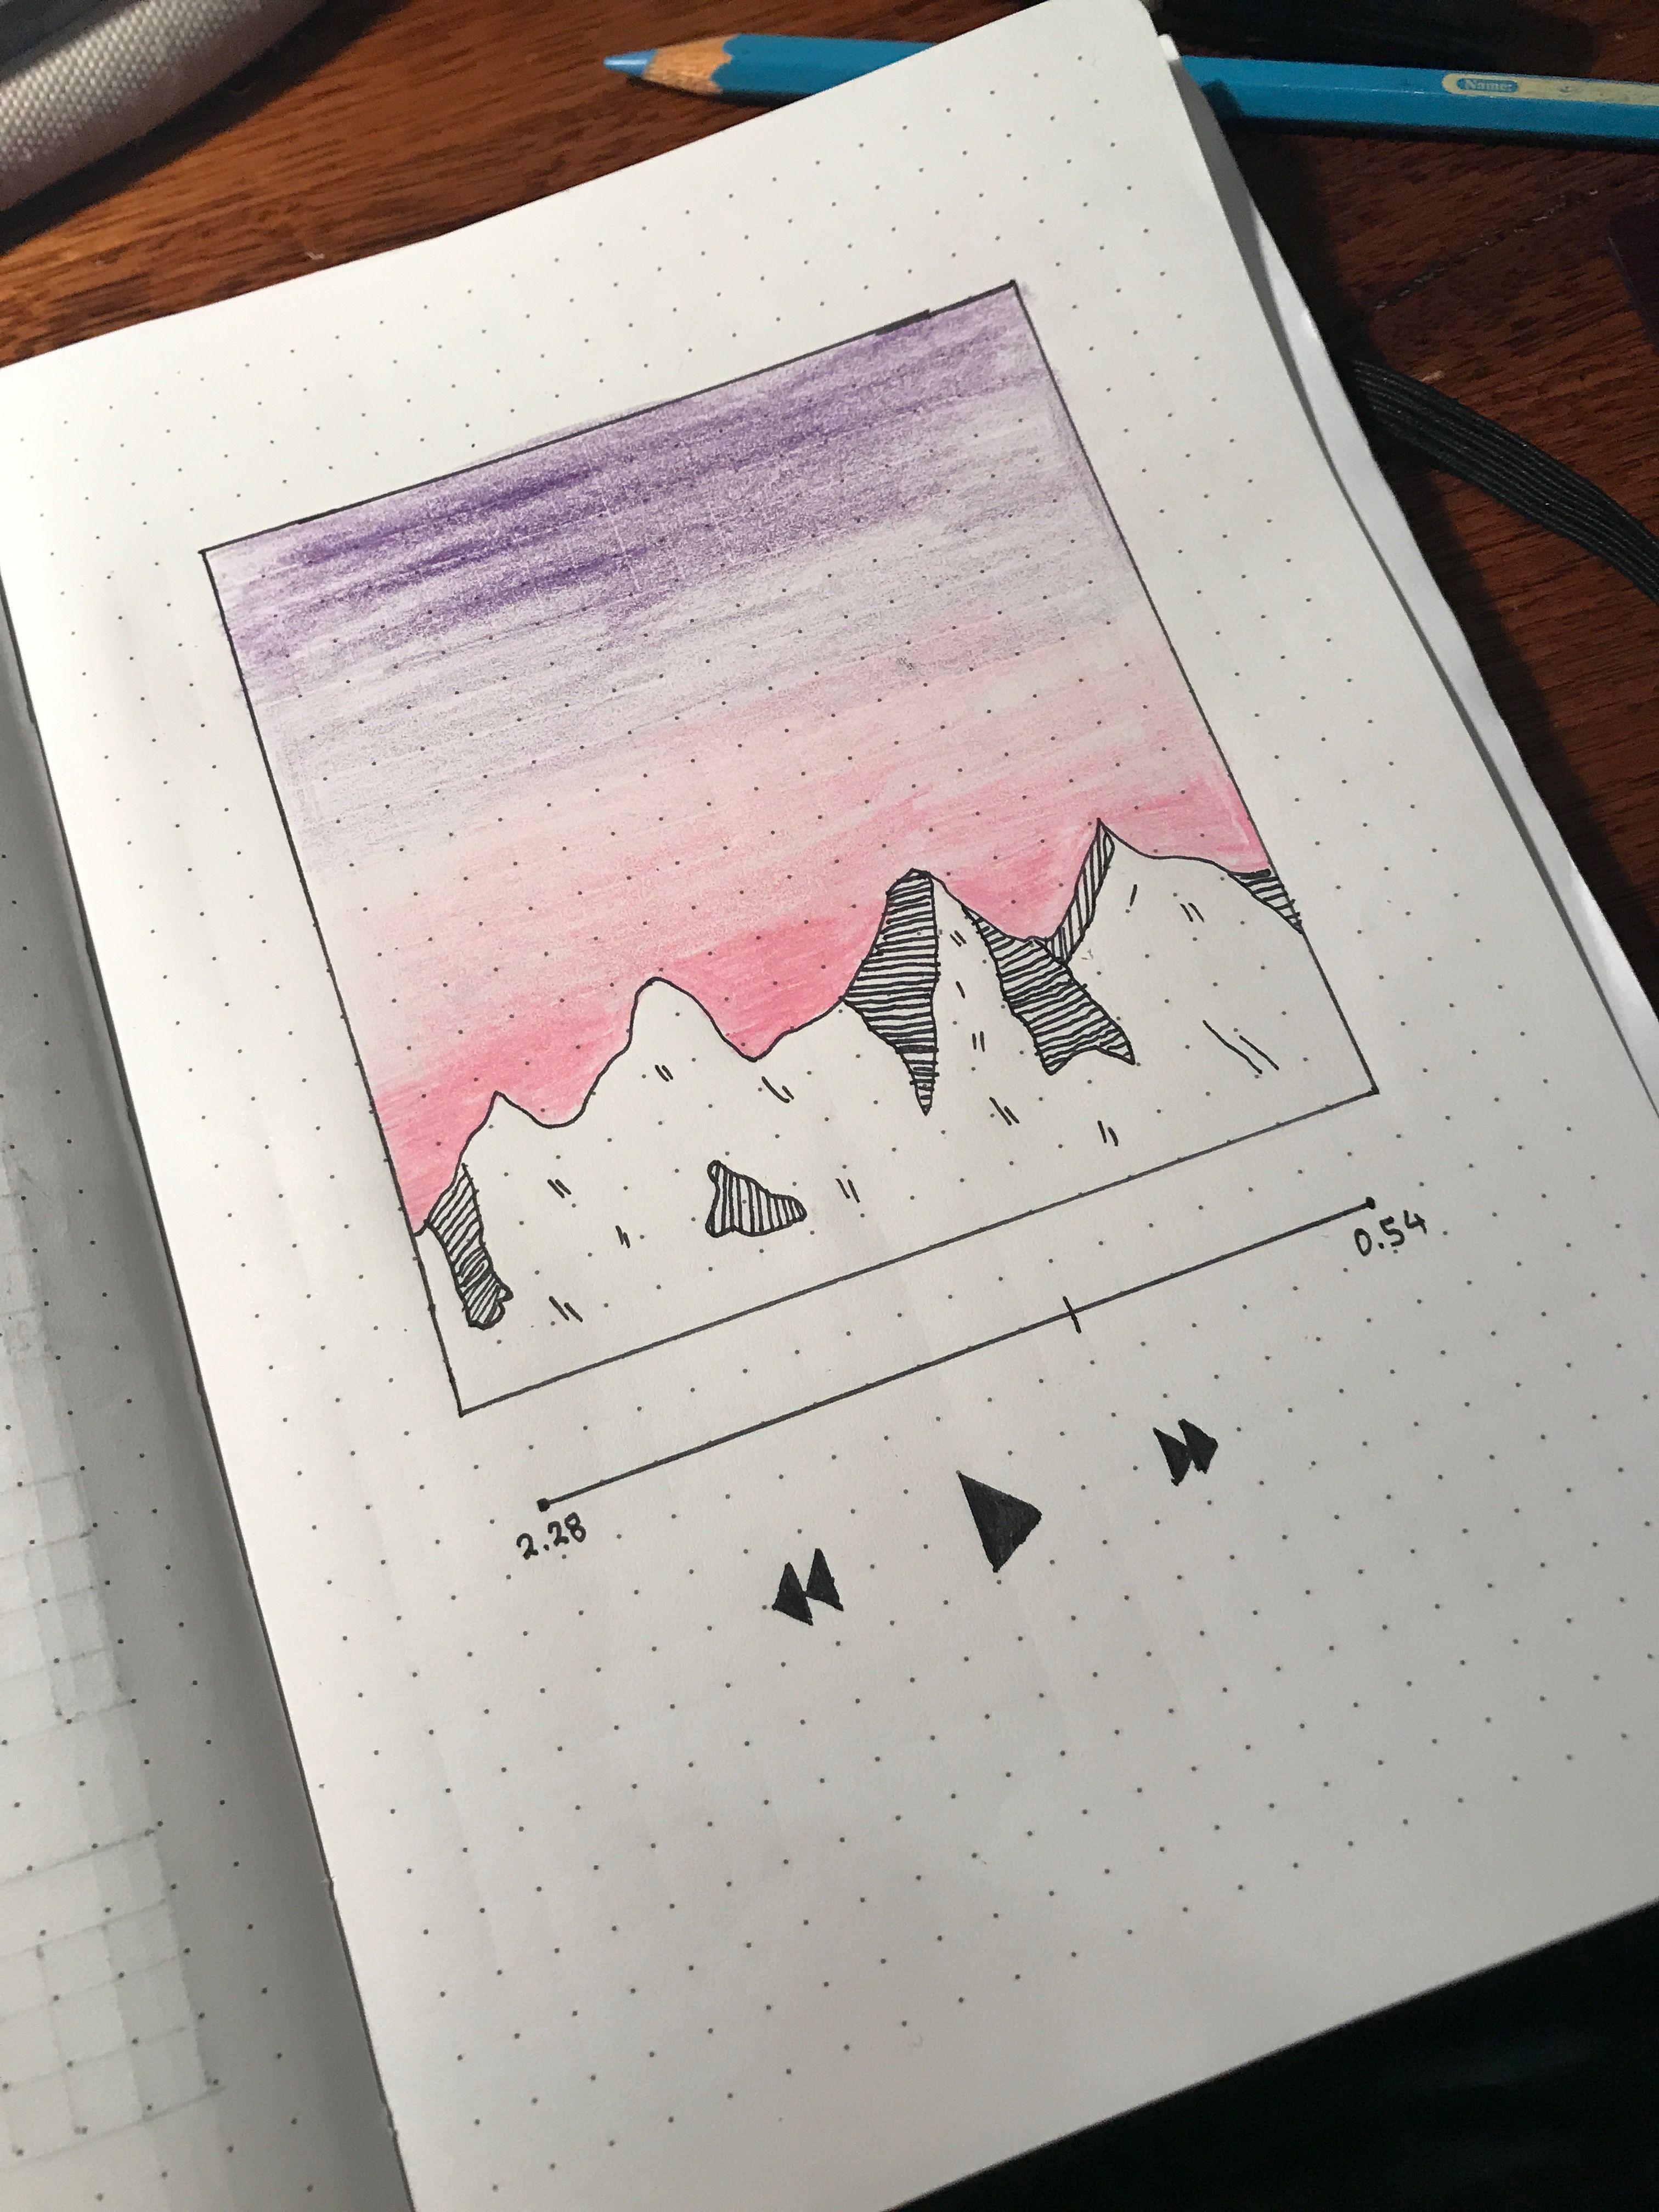 Sejchas Narisovala Desenho Hippie Desenhos Tumblrs E Esbocos Da Arte